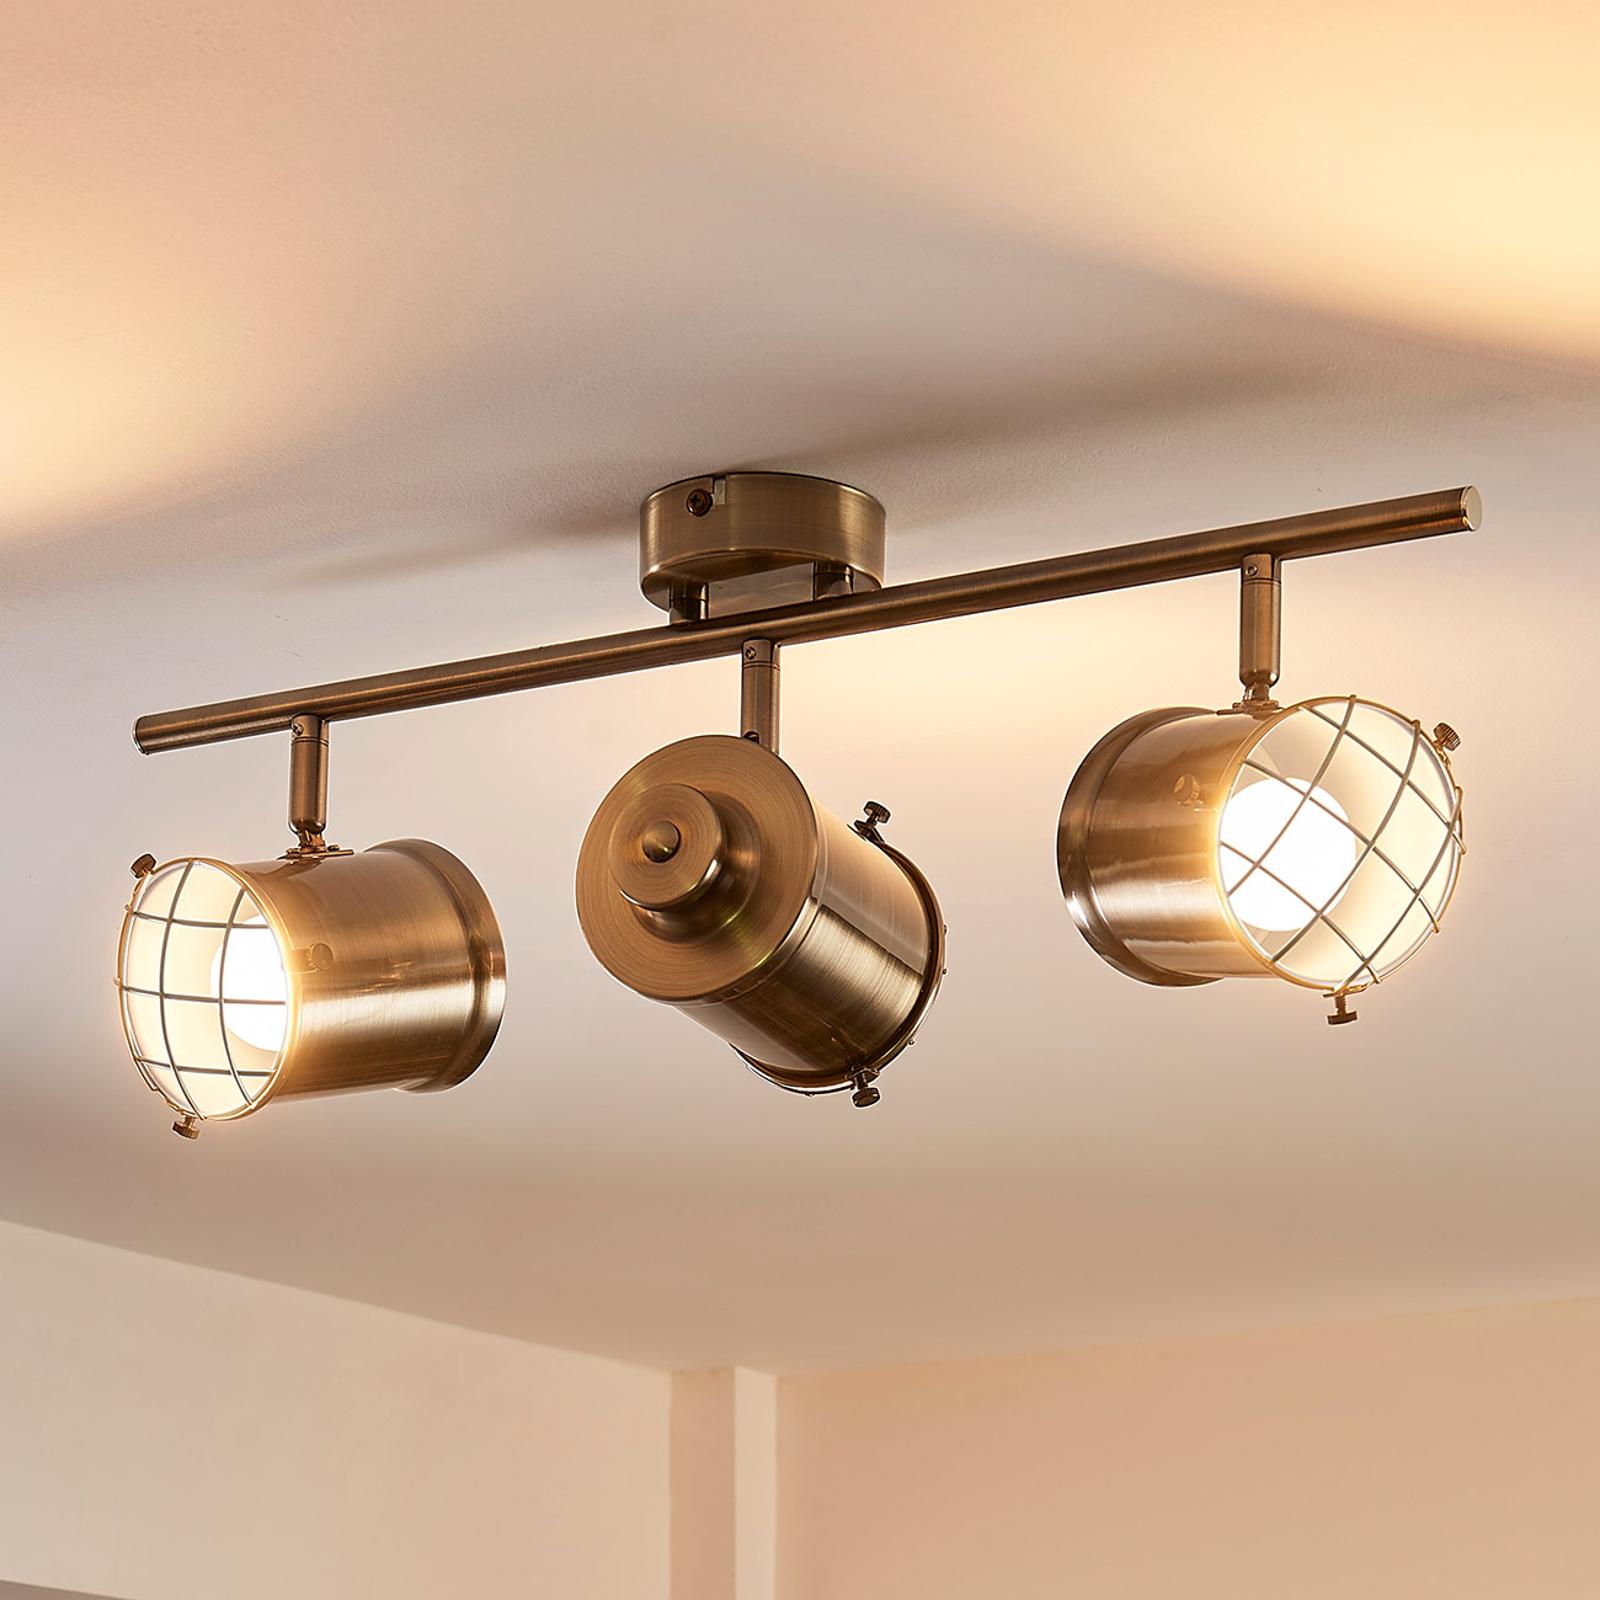 Lámpara de techo Easydim Ebbi con LED, tres luces